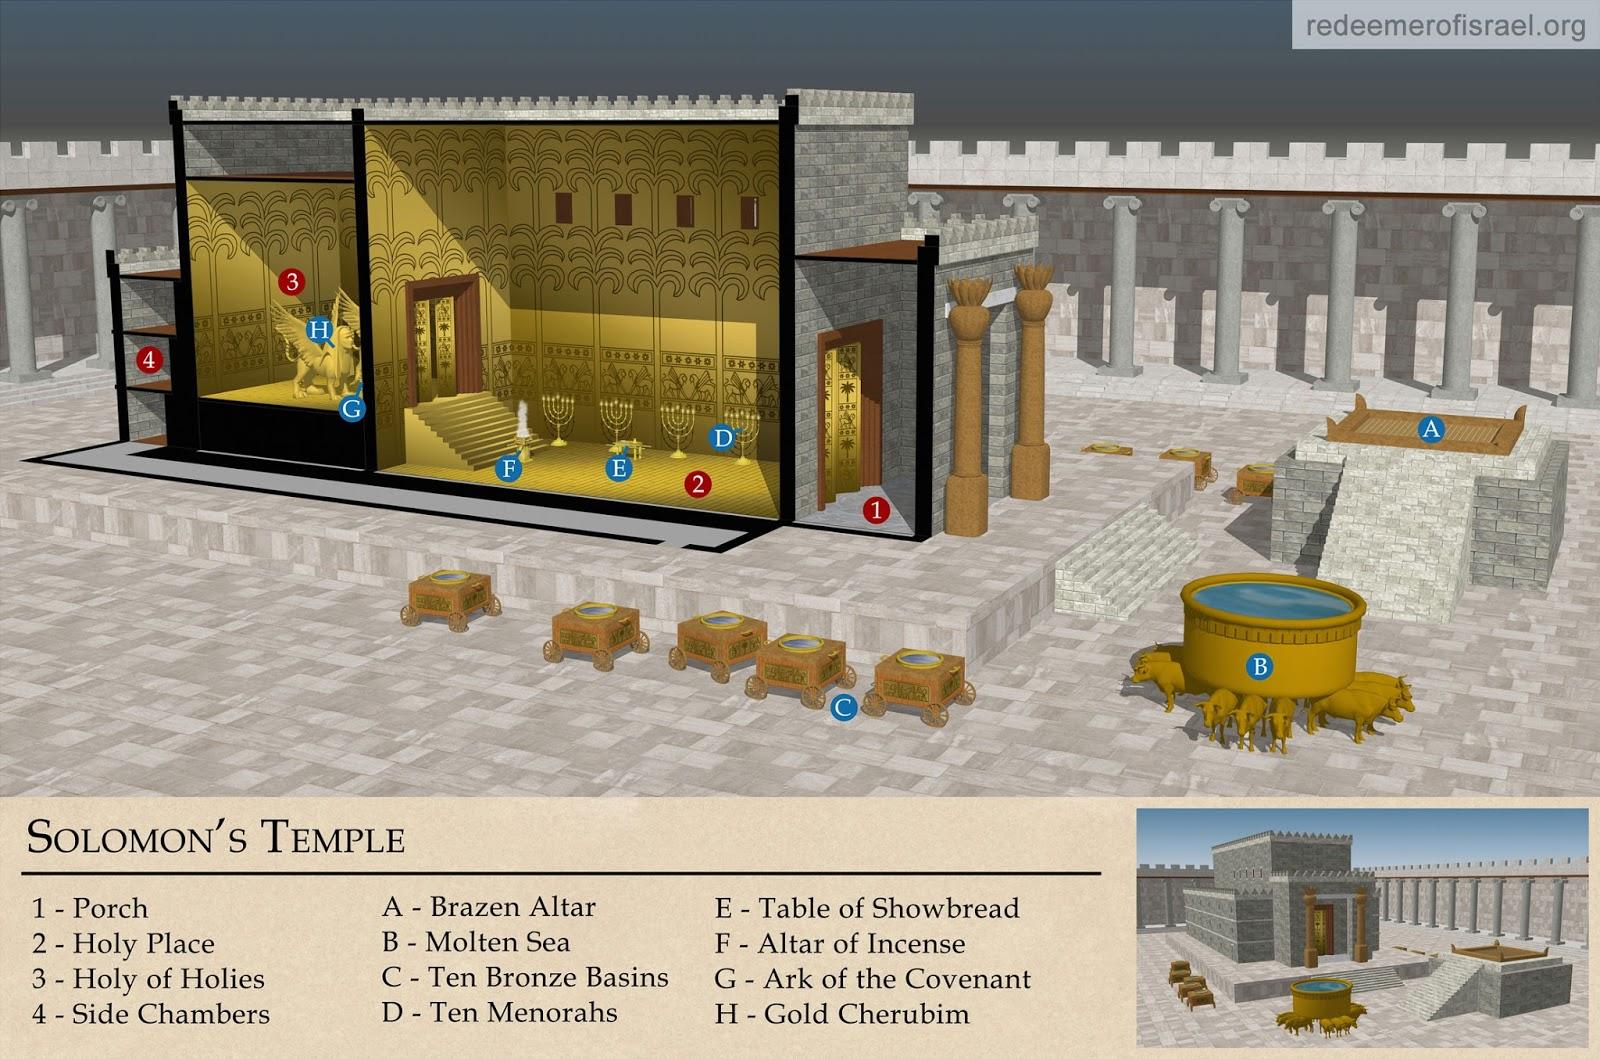 Dating solomon's temple